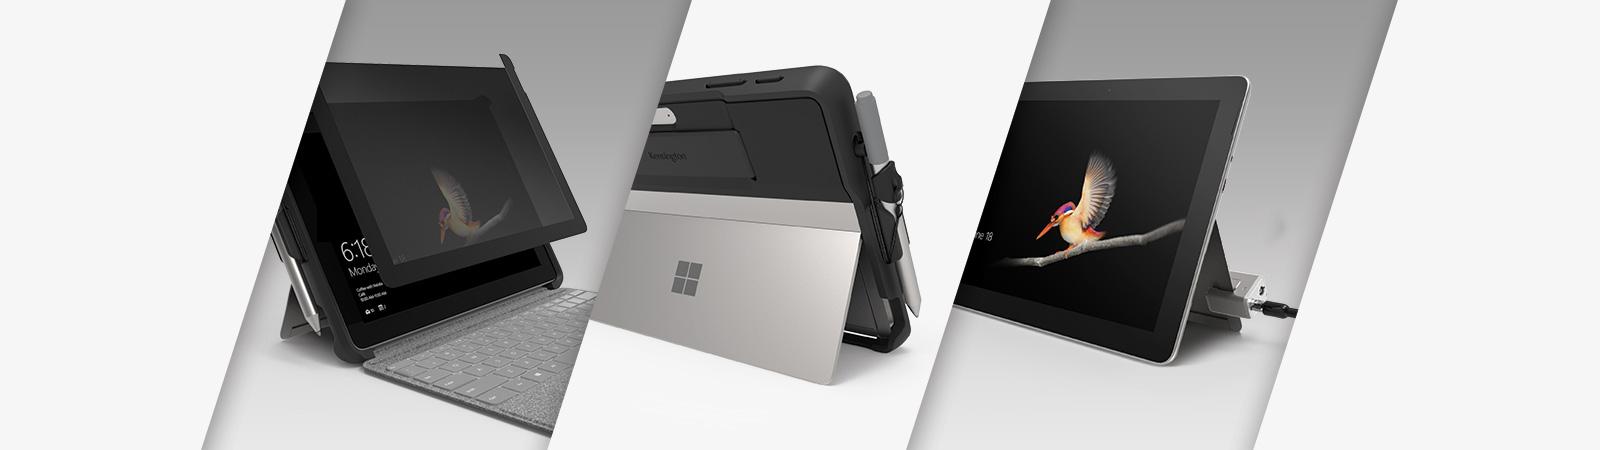 Spotlight on Kensington\u0027s Surface Go and Surface Pro Accessories